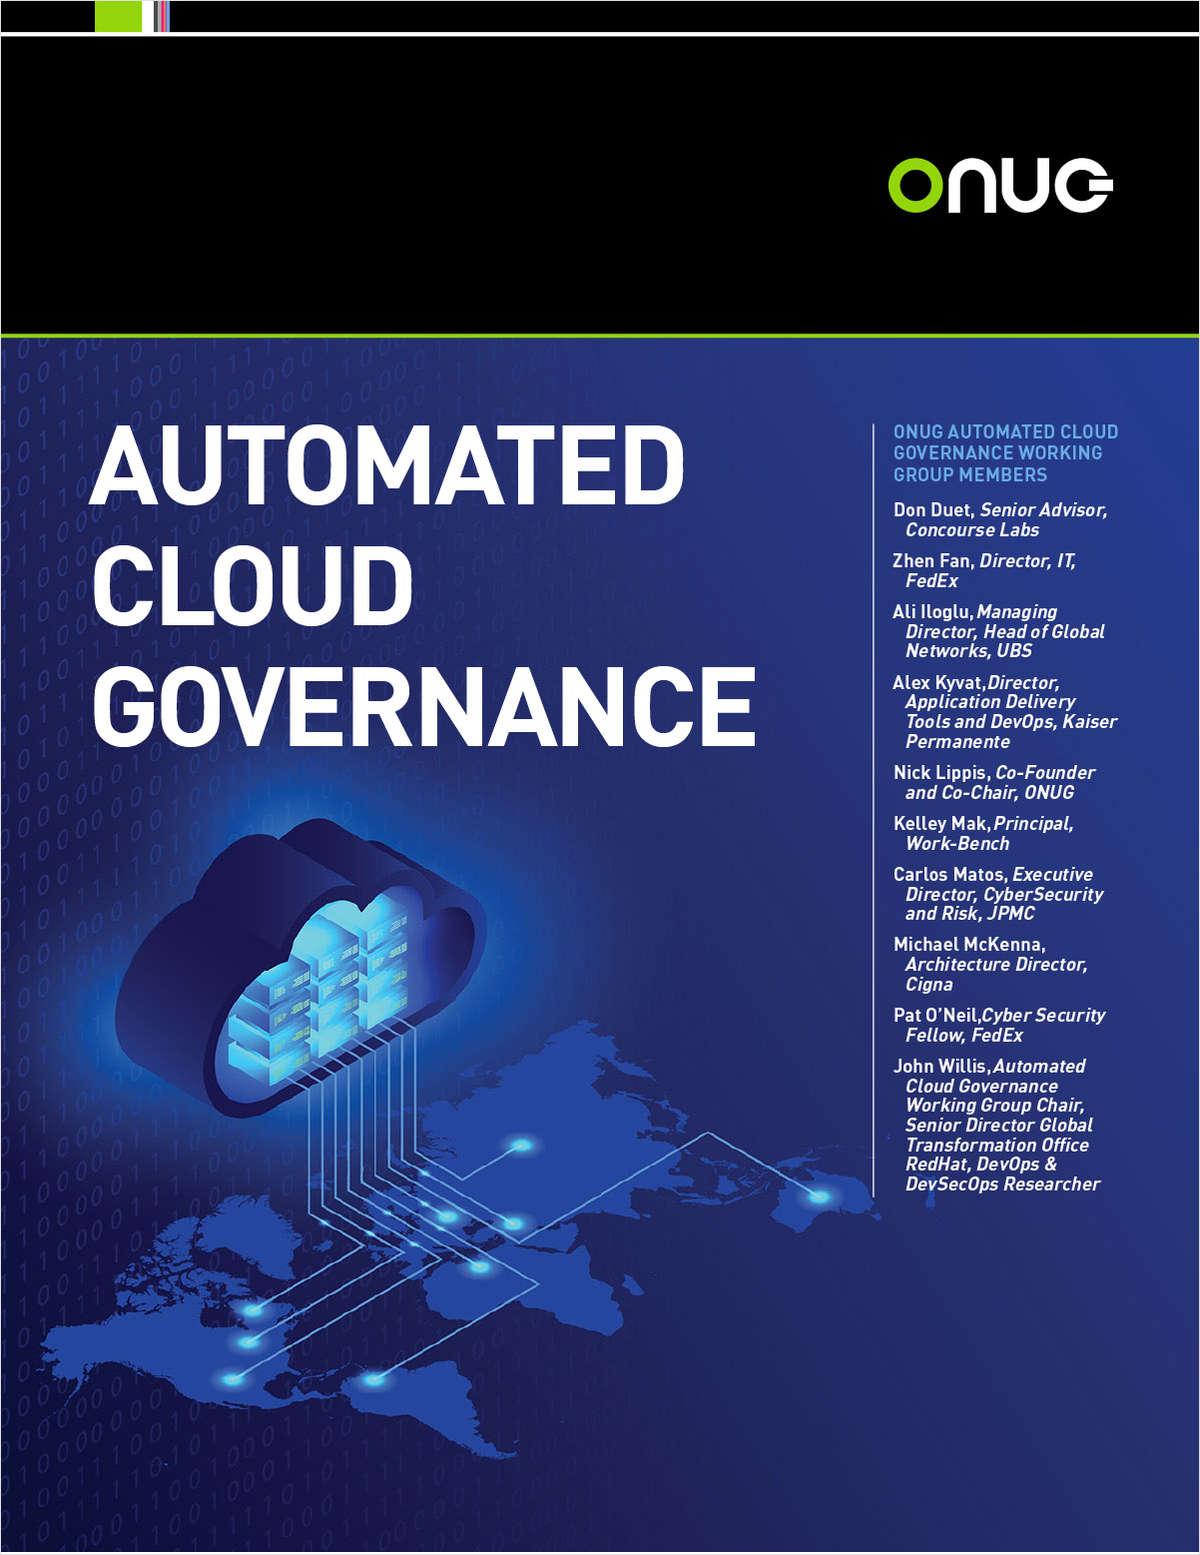 Automated Cloud Governance: The ONUG Collaborative